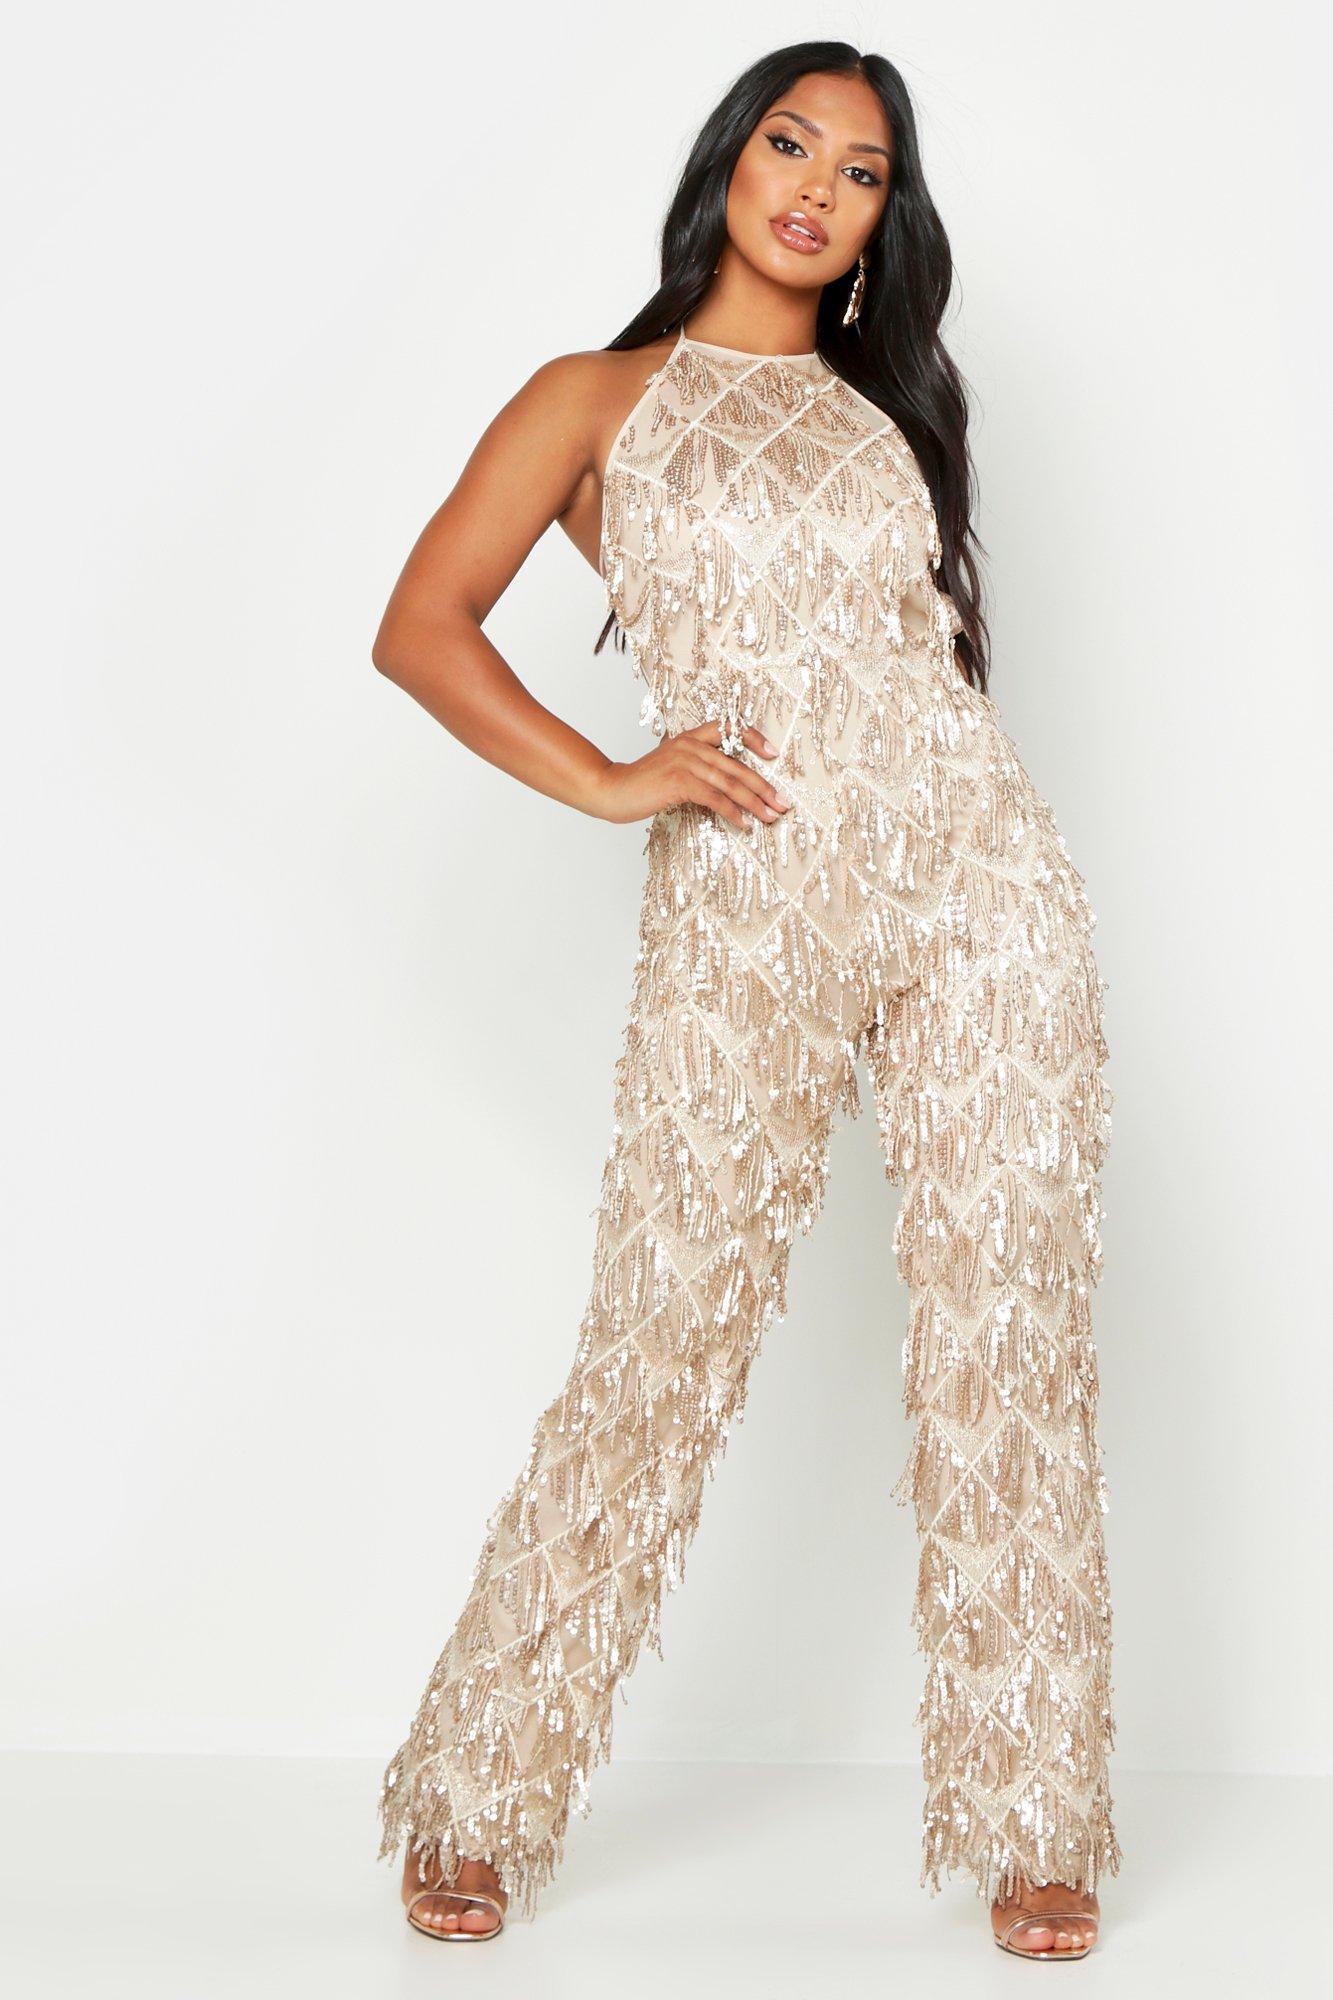 70s Dresses – Disco Dress, Hippie Dress, Wrap Dress All Over Sequin Low Back Jumpsuit  AT vintagedancer.com